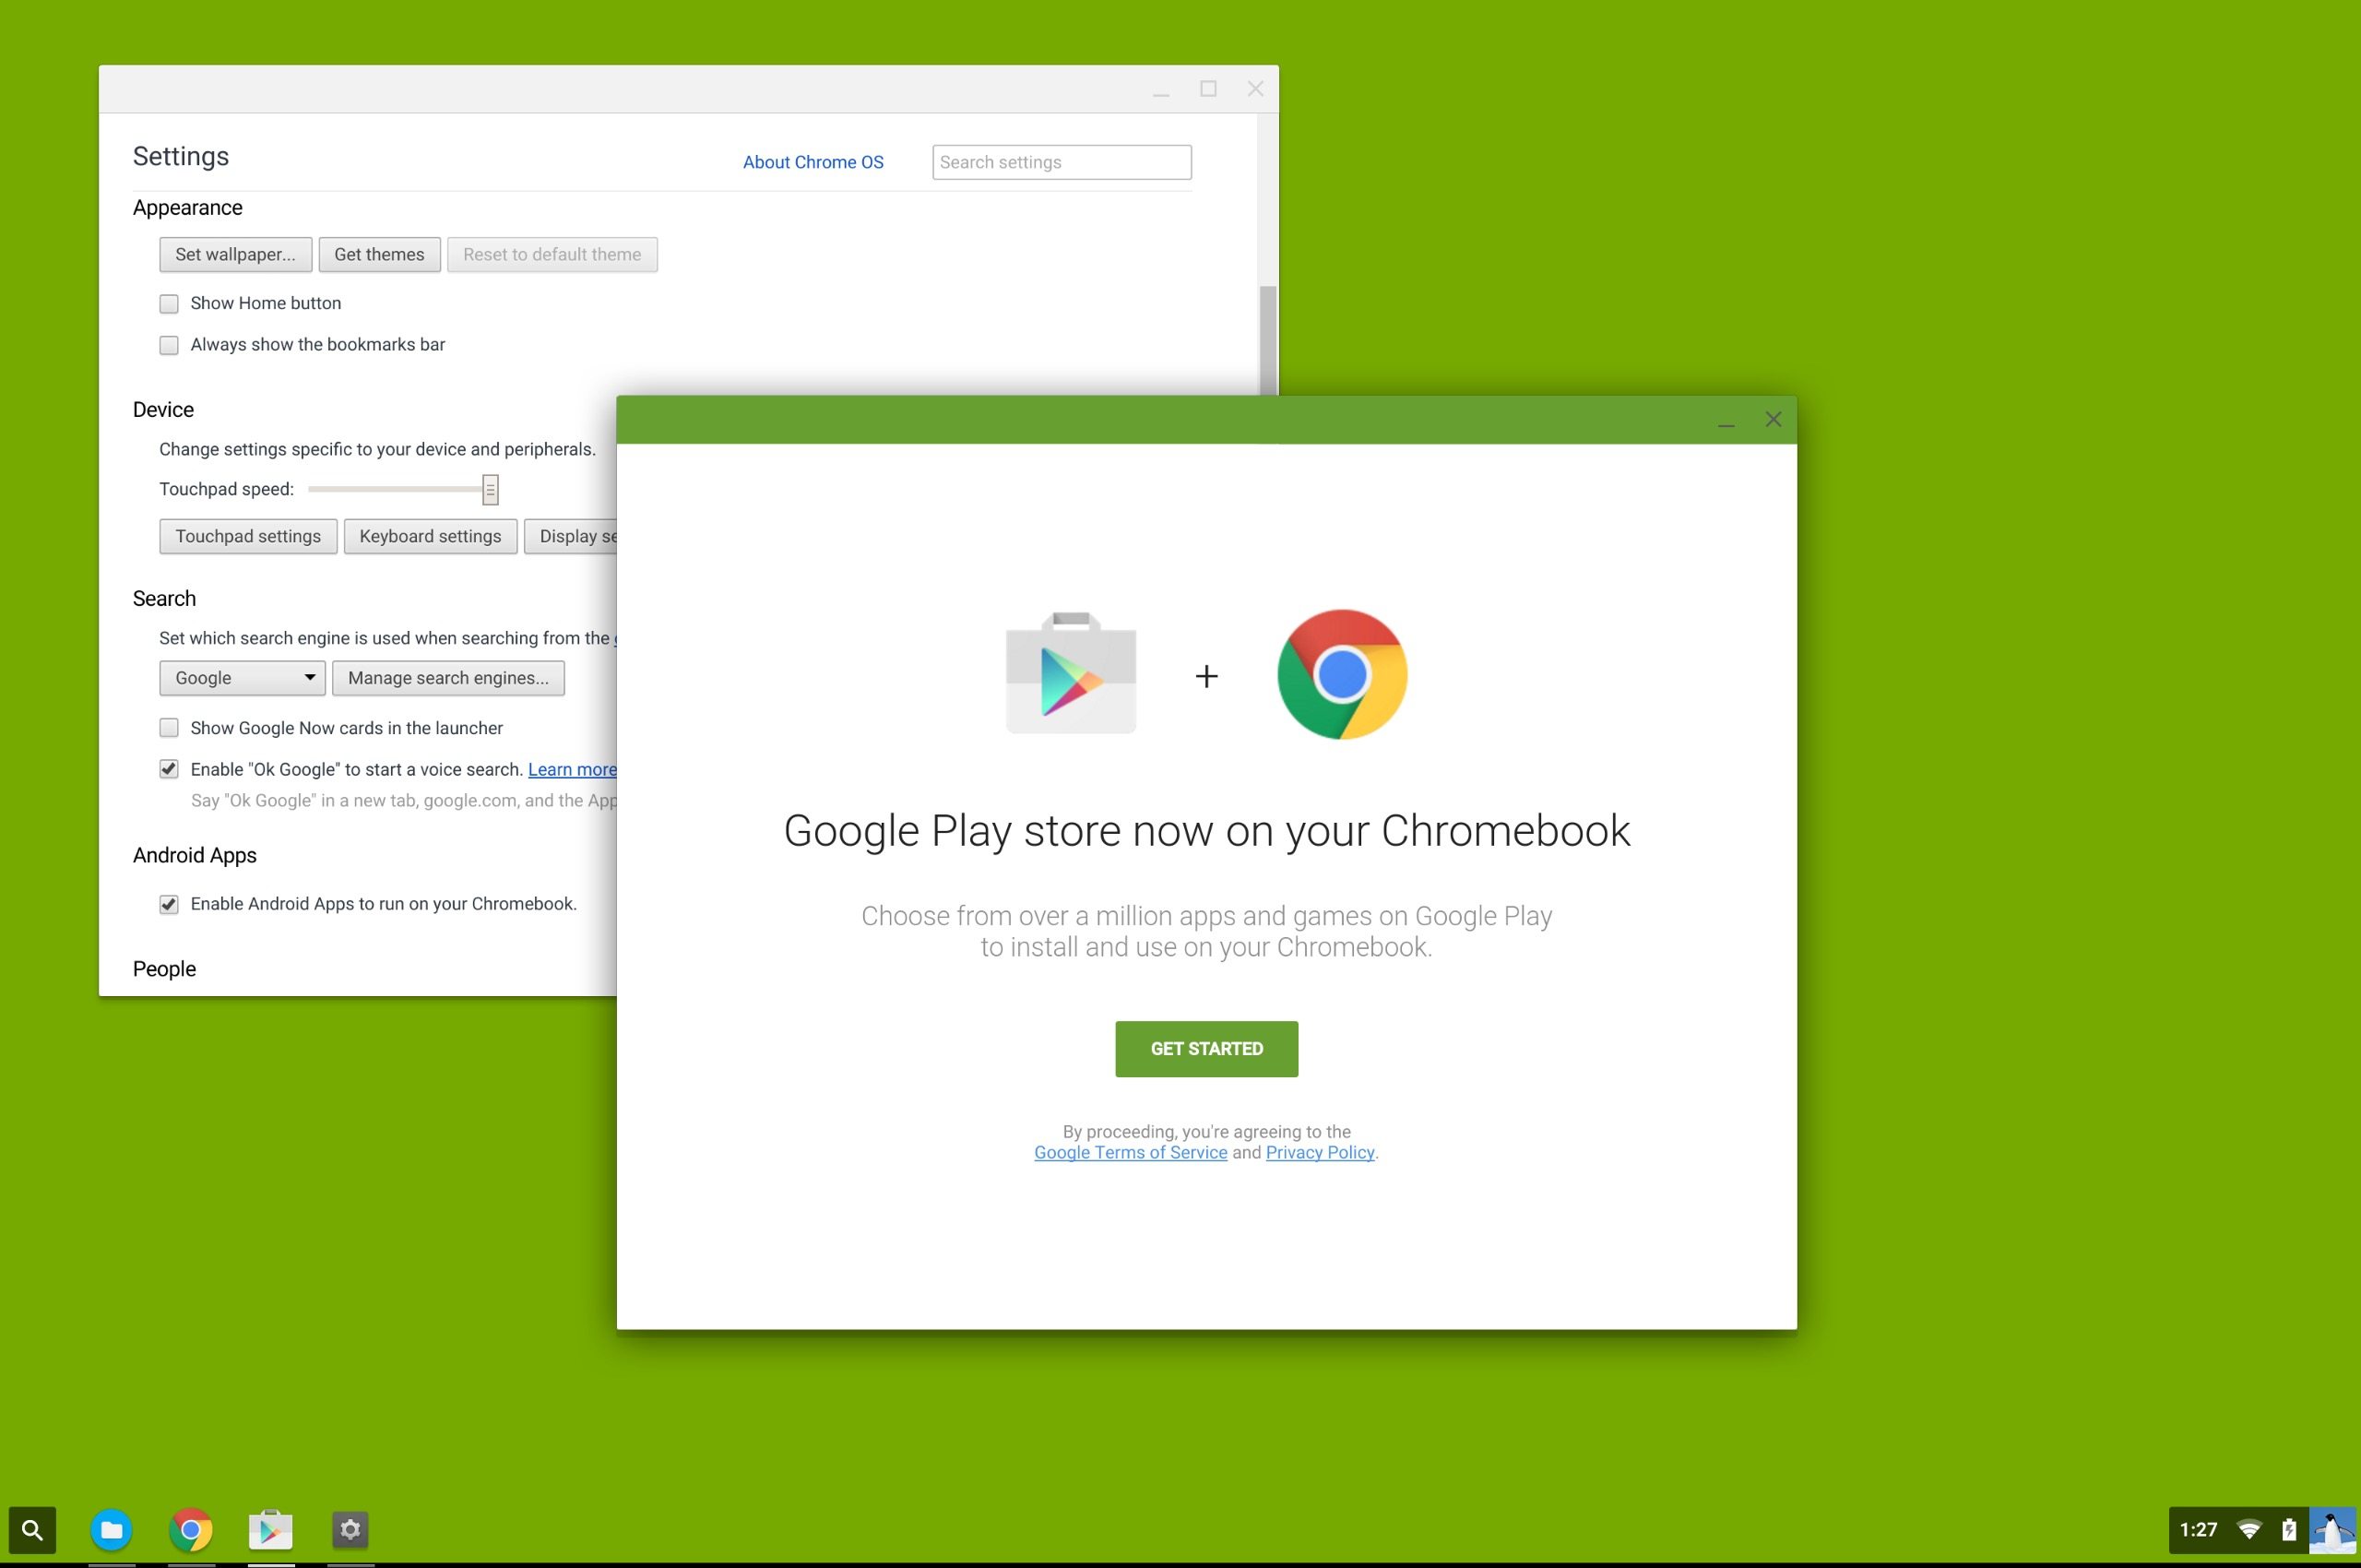 Google llevará muy pronto la Play Store a los Chromebooks